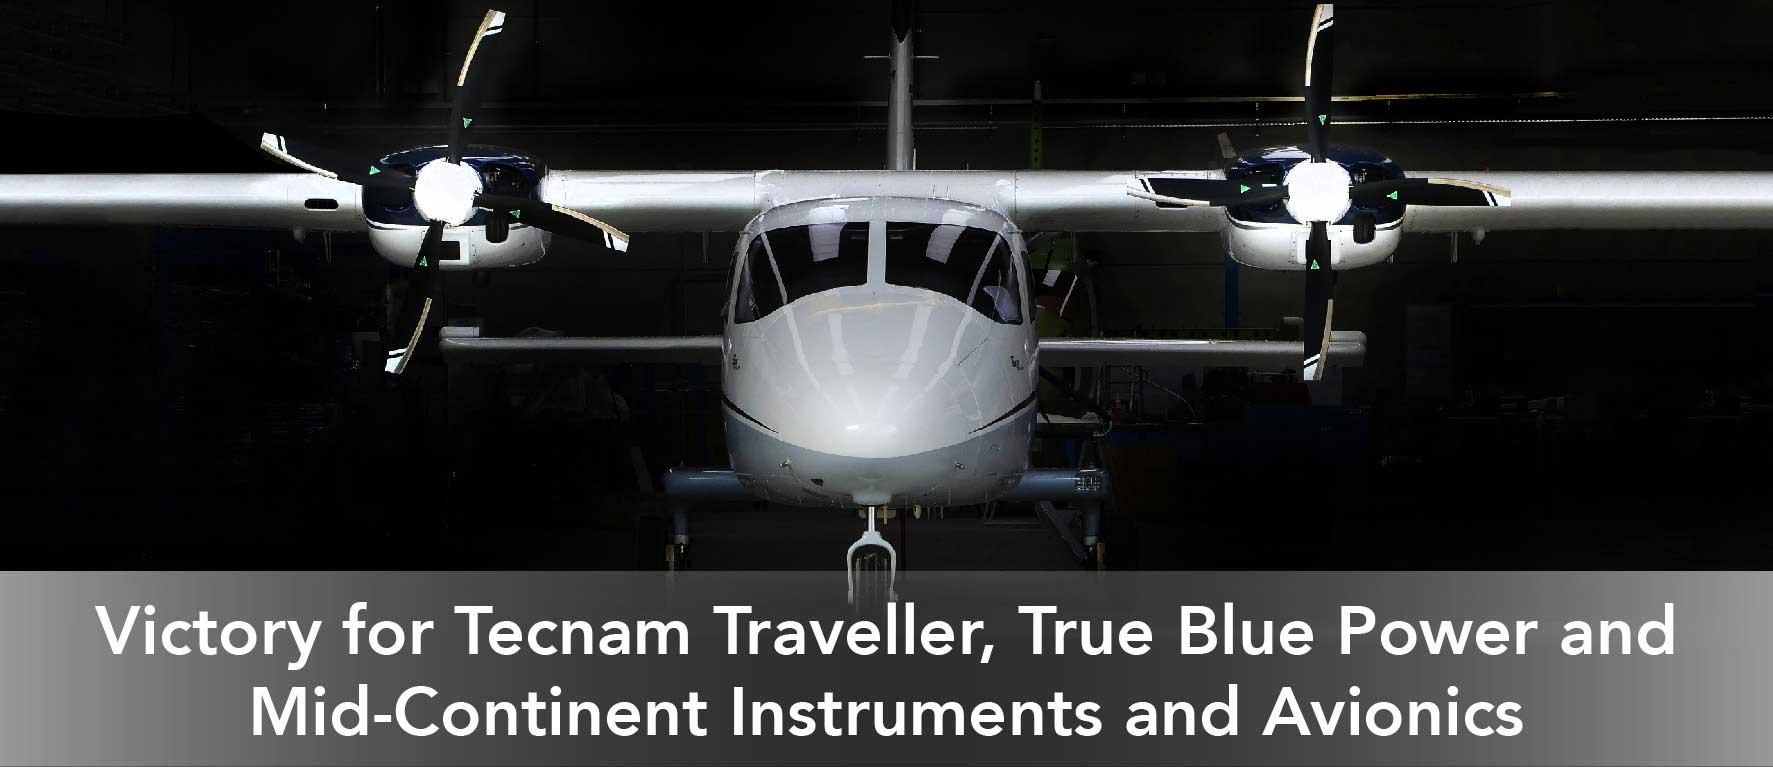 Aviation Parts Supplier | Mid-Continent Instruments and Avionics